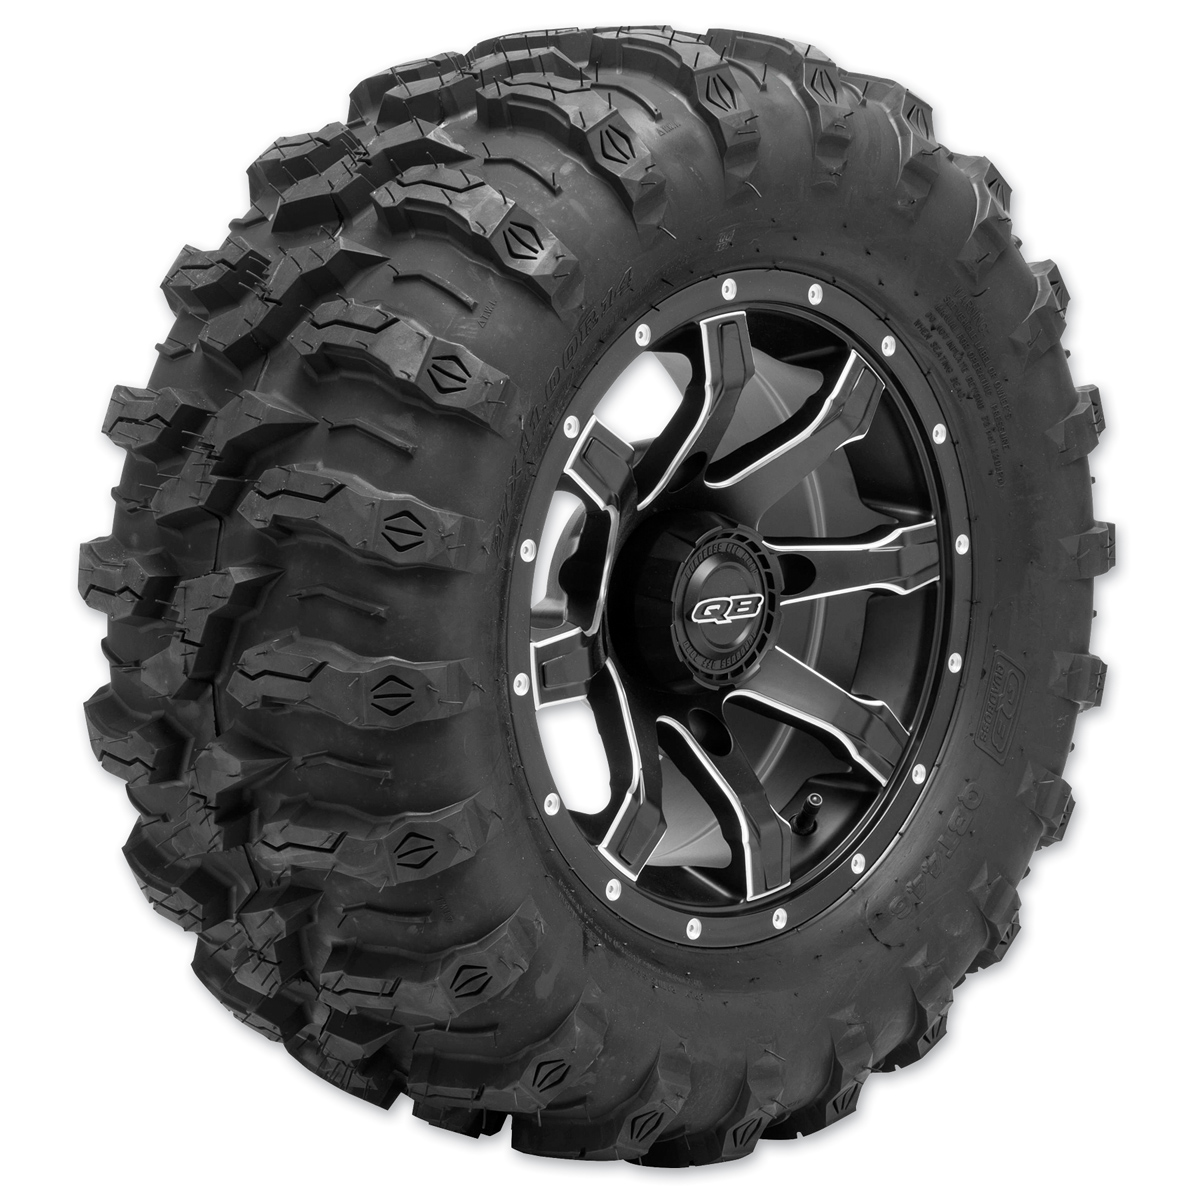 Quadboss QBT446 26X11R12 8-Ply Rear Tire